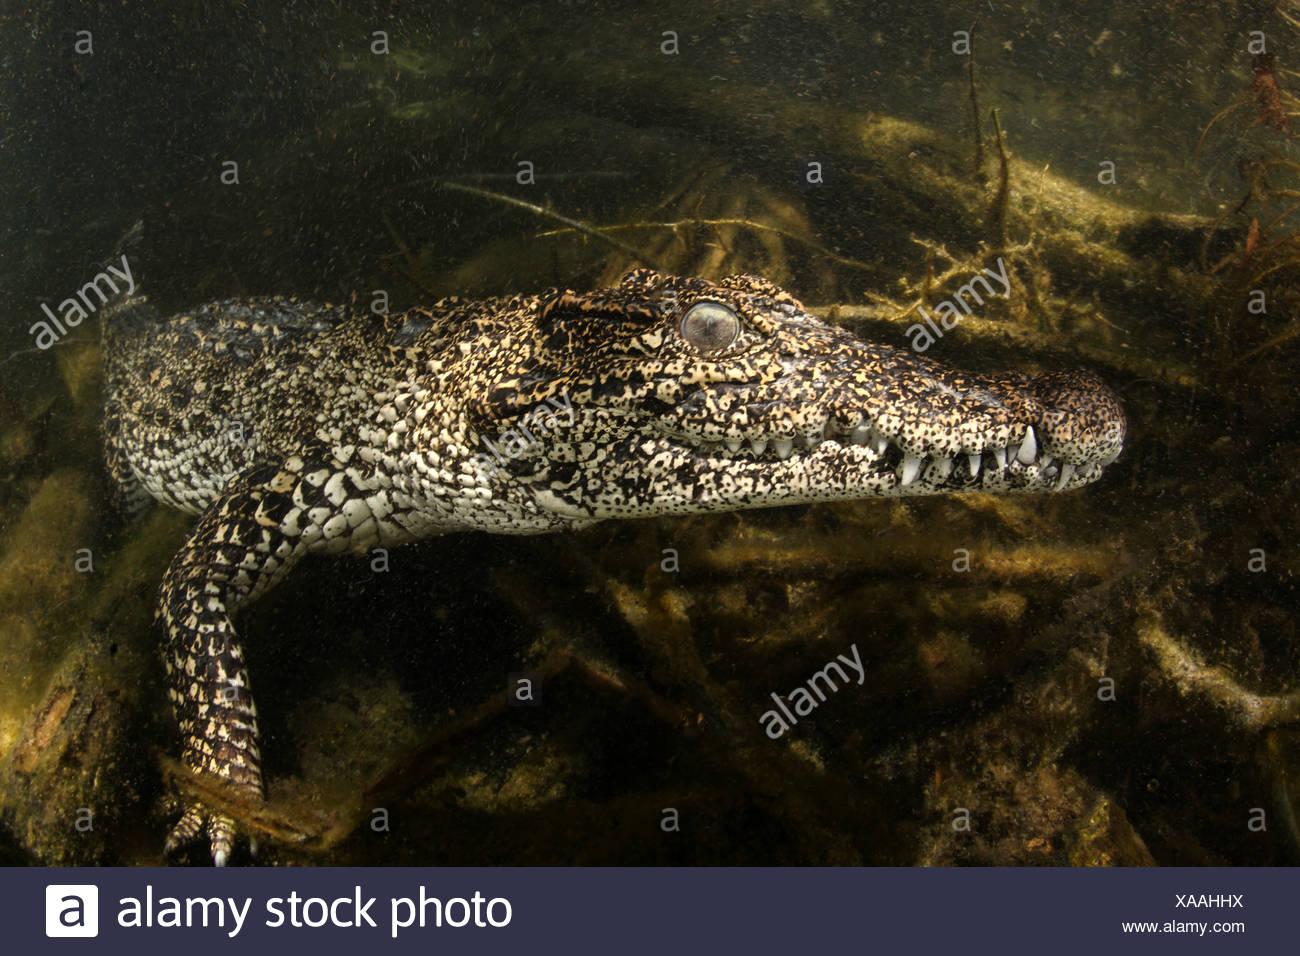 Endemische kubanische Krokodil Crocodylus Rhombifer, Isla De La Juventud, Kuba Stockbild